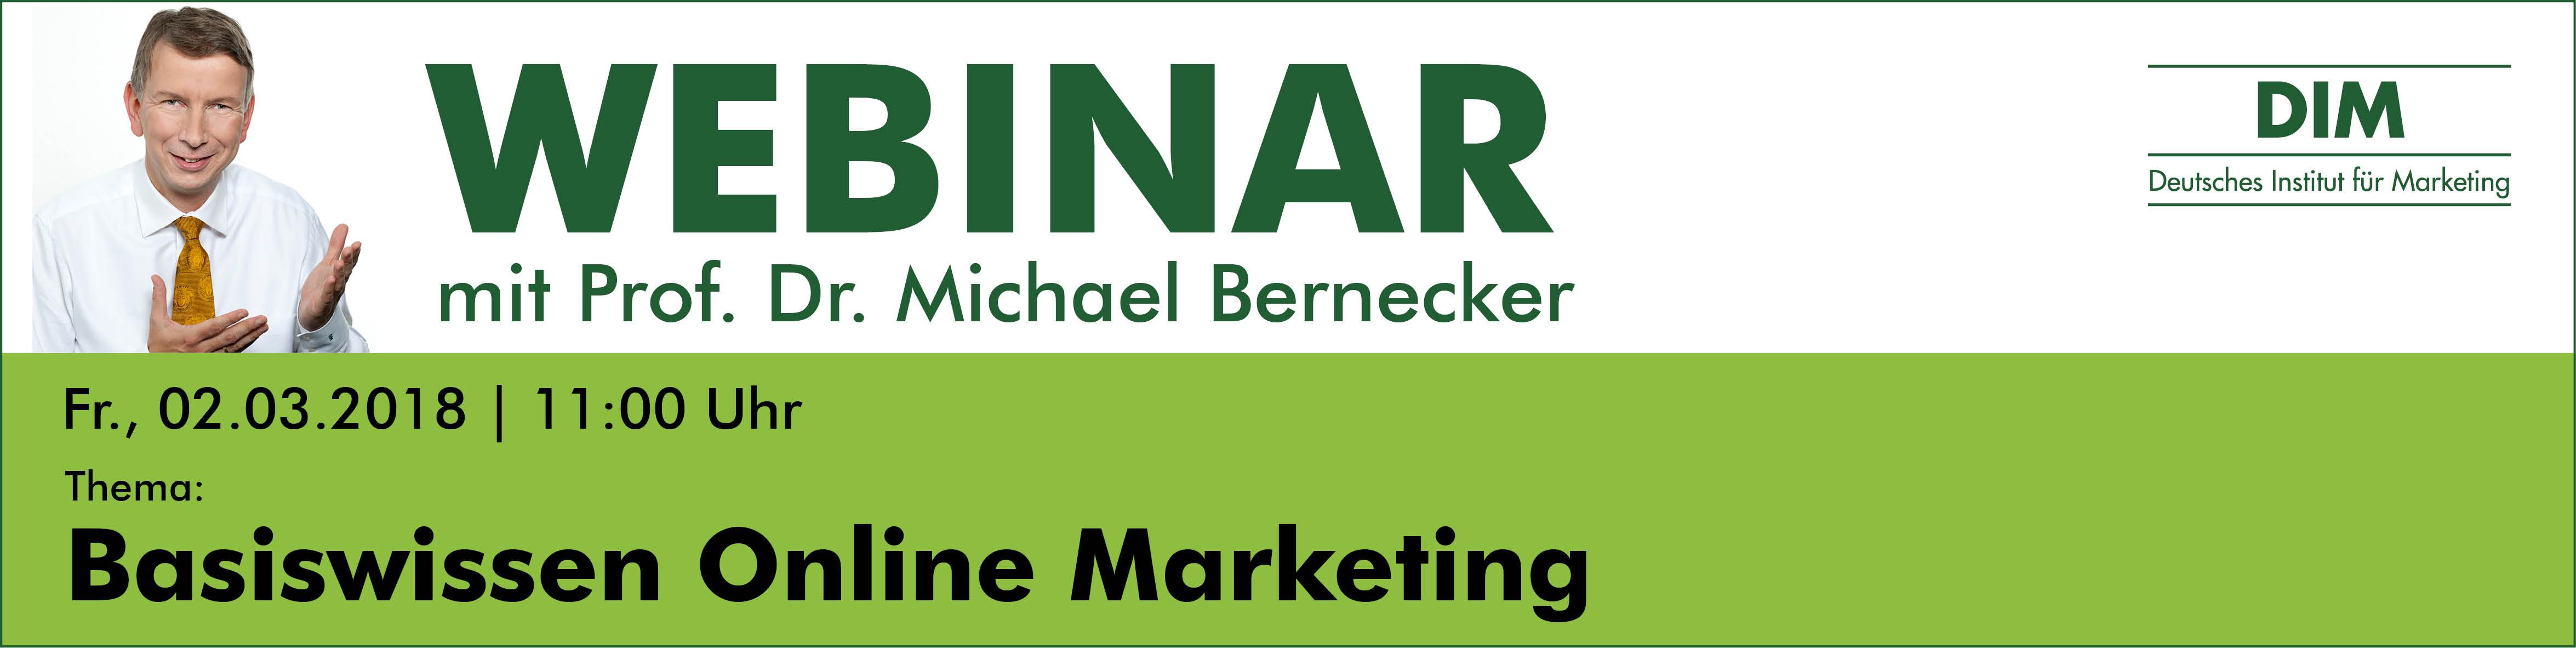 Live-Webinar Basiswissen Online Marketing